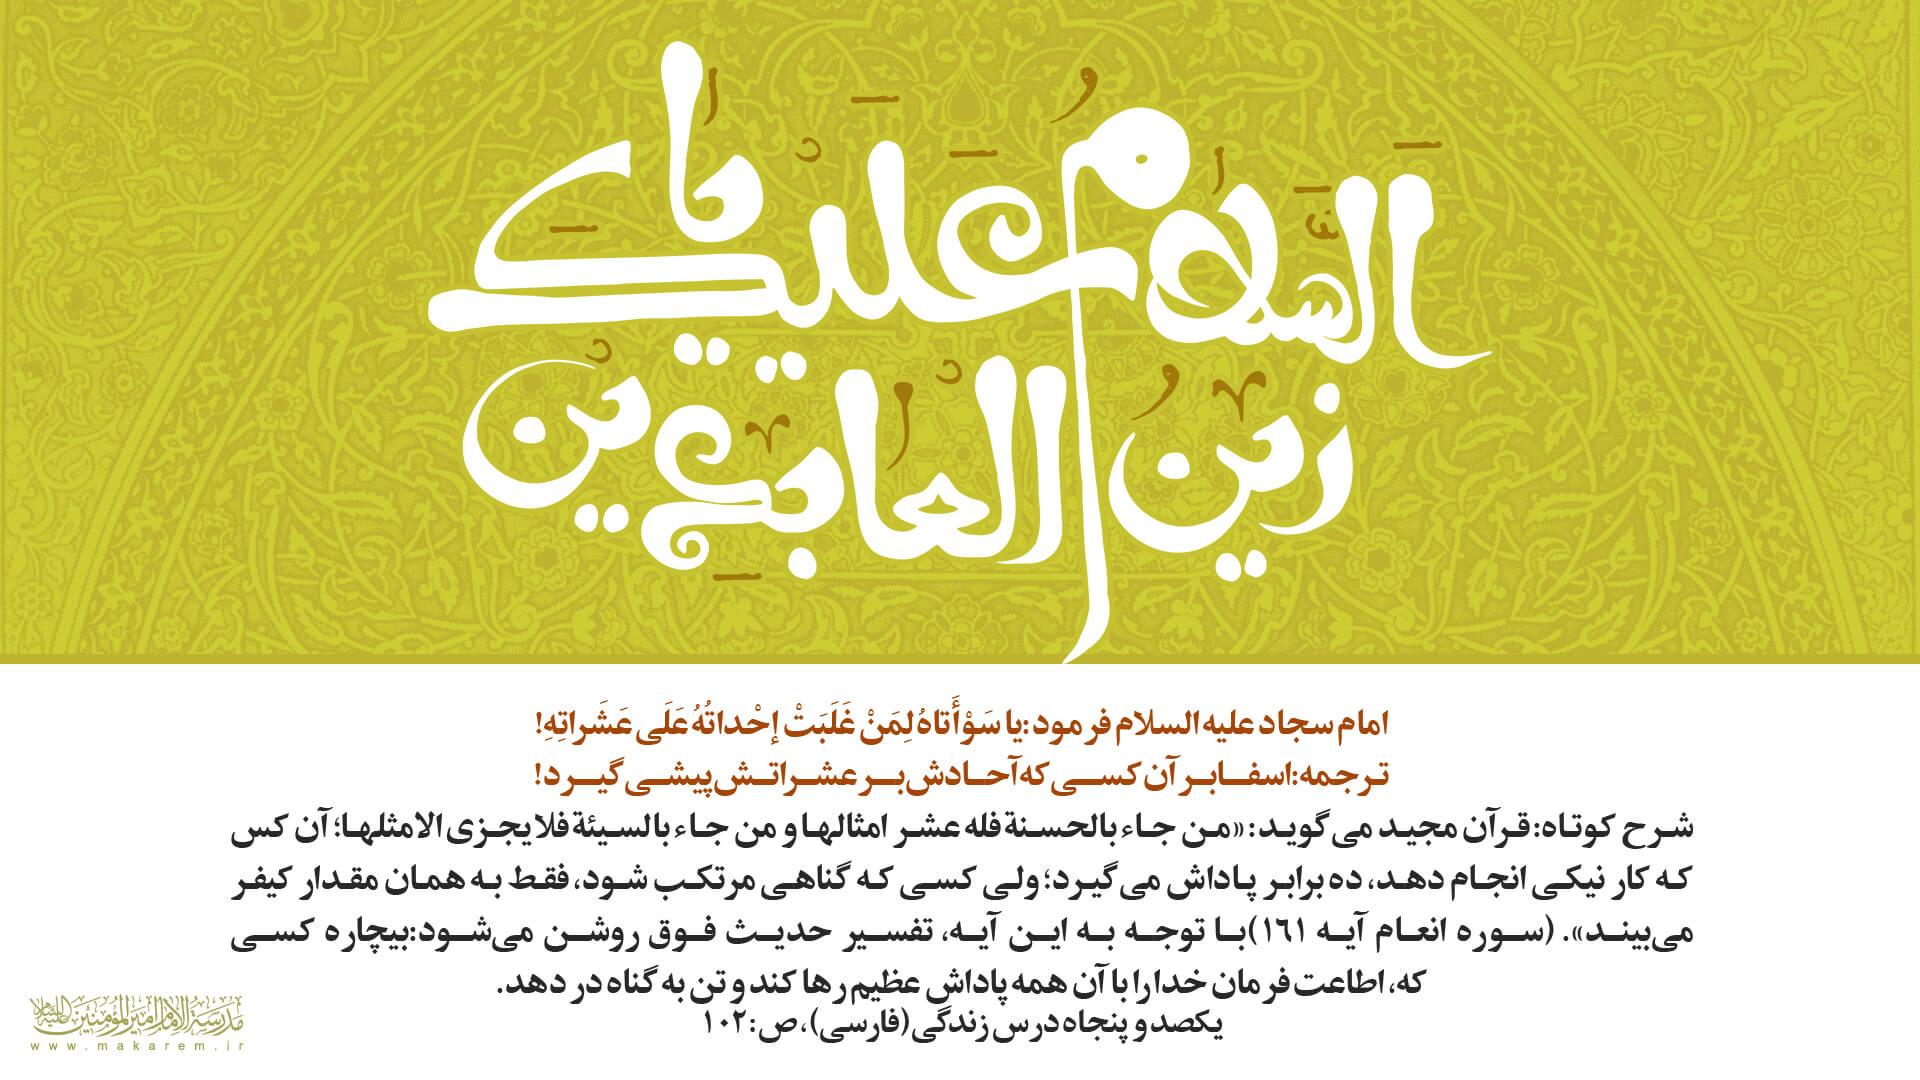 امام سجاد 03-مدرسه الامام امیر المومنین (ع)